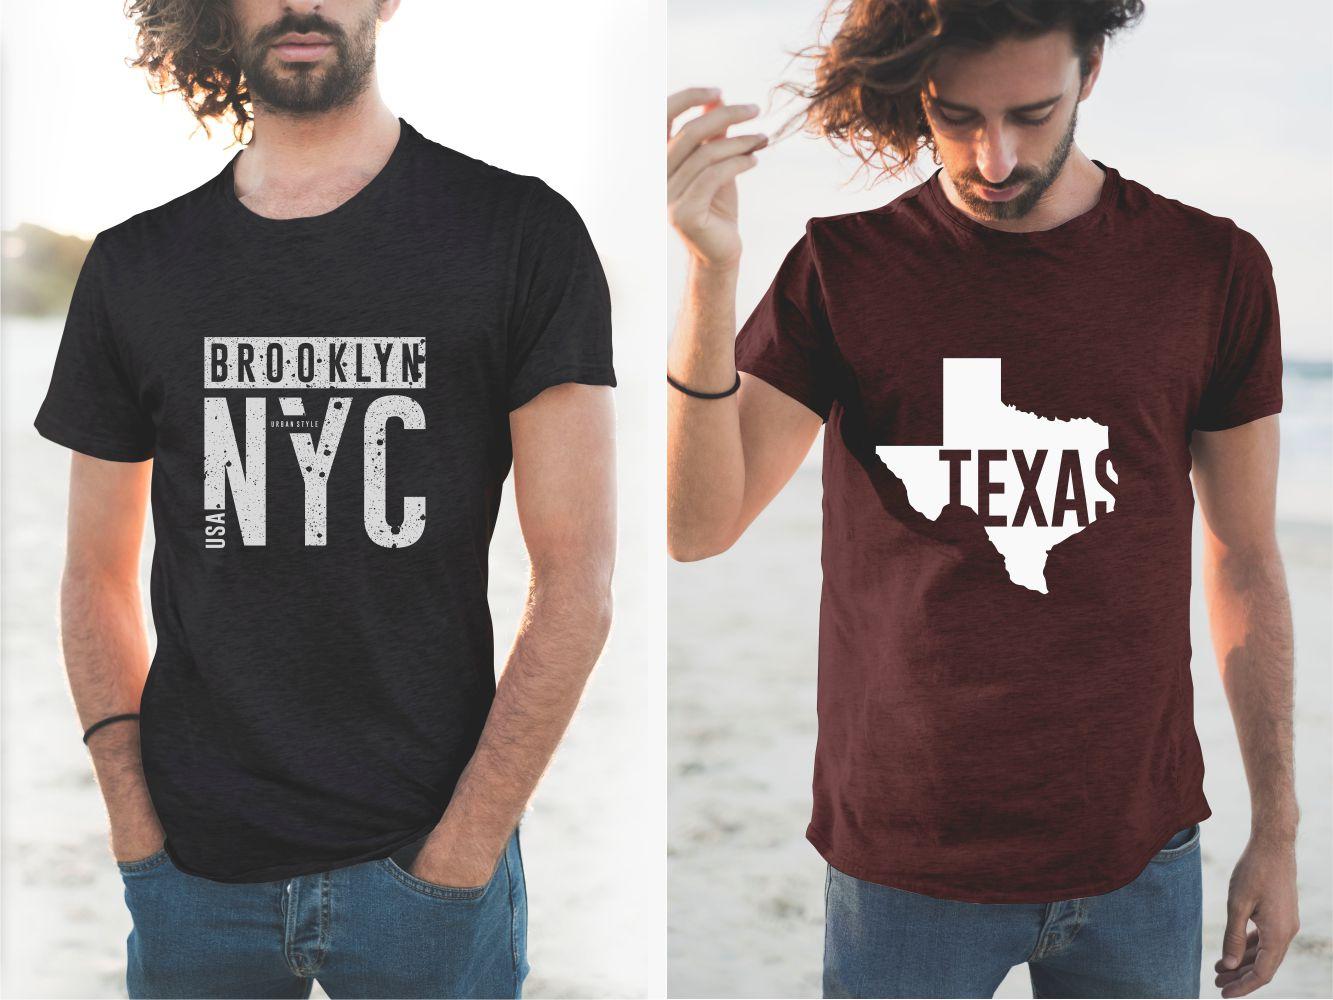 106 Urban T-shirt Designs Collection - 36 1